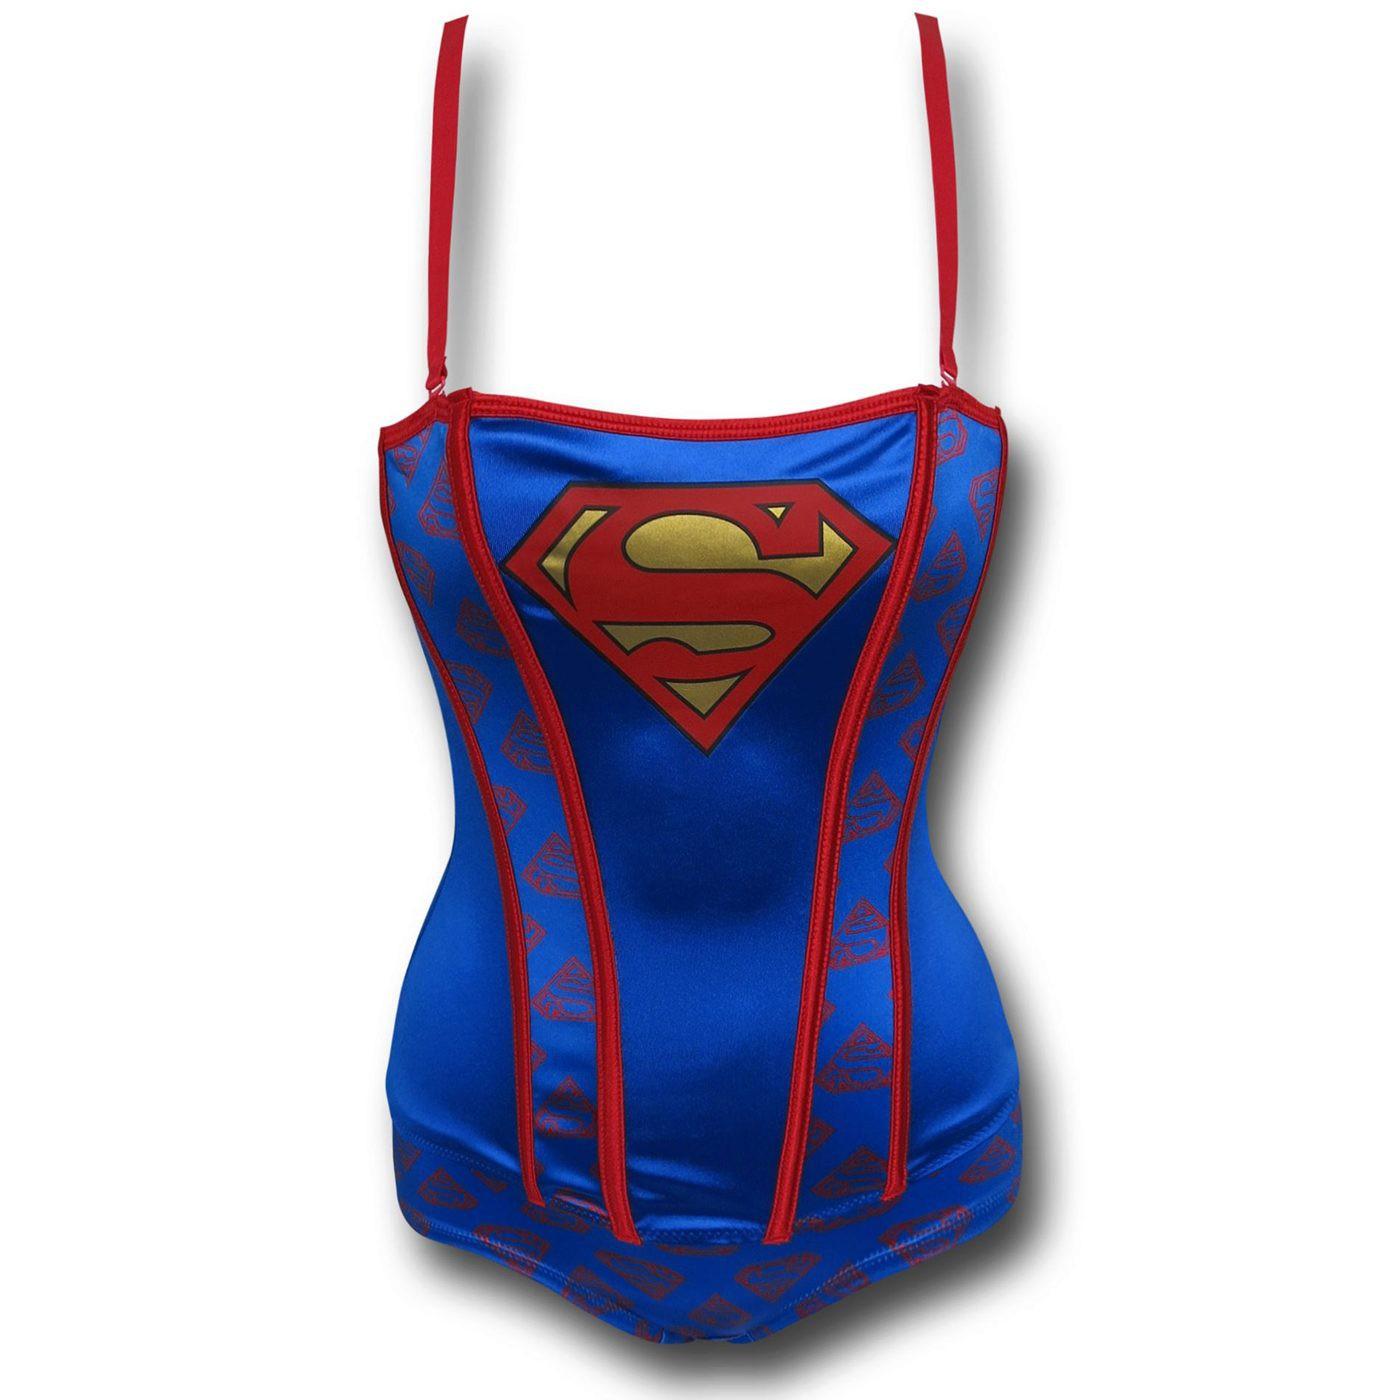 Supergirl Stretch Satin Women's Corset & Panty Set